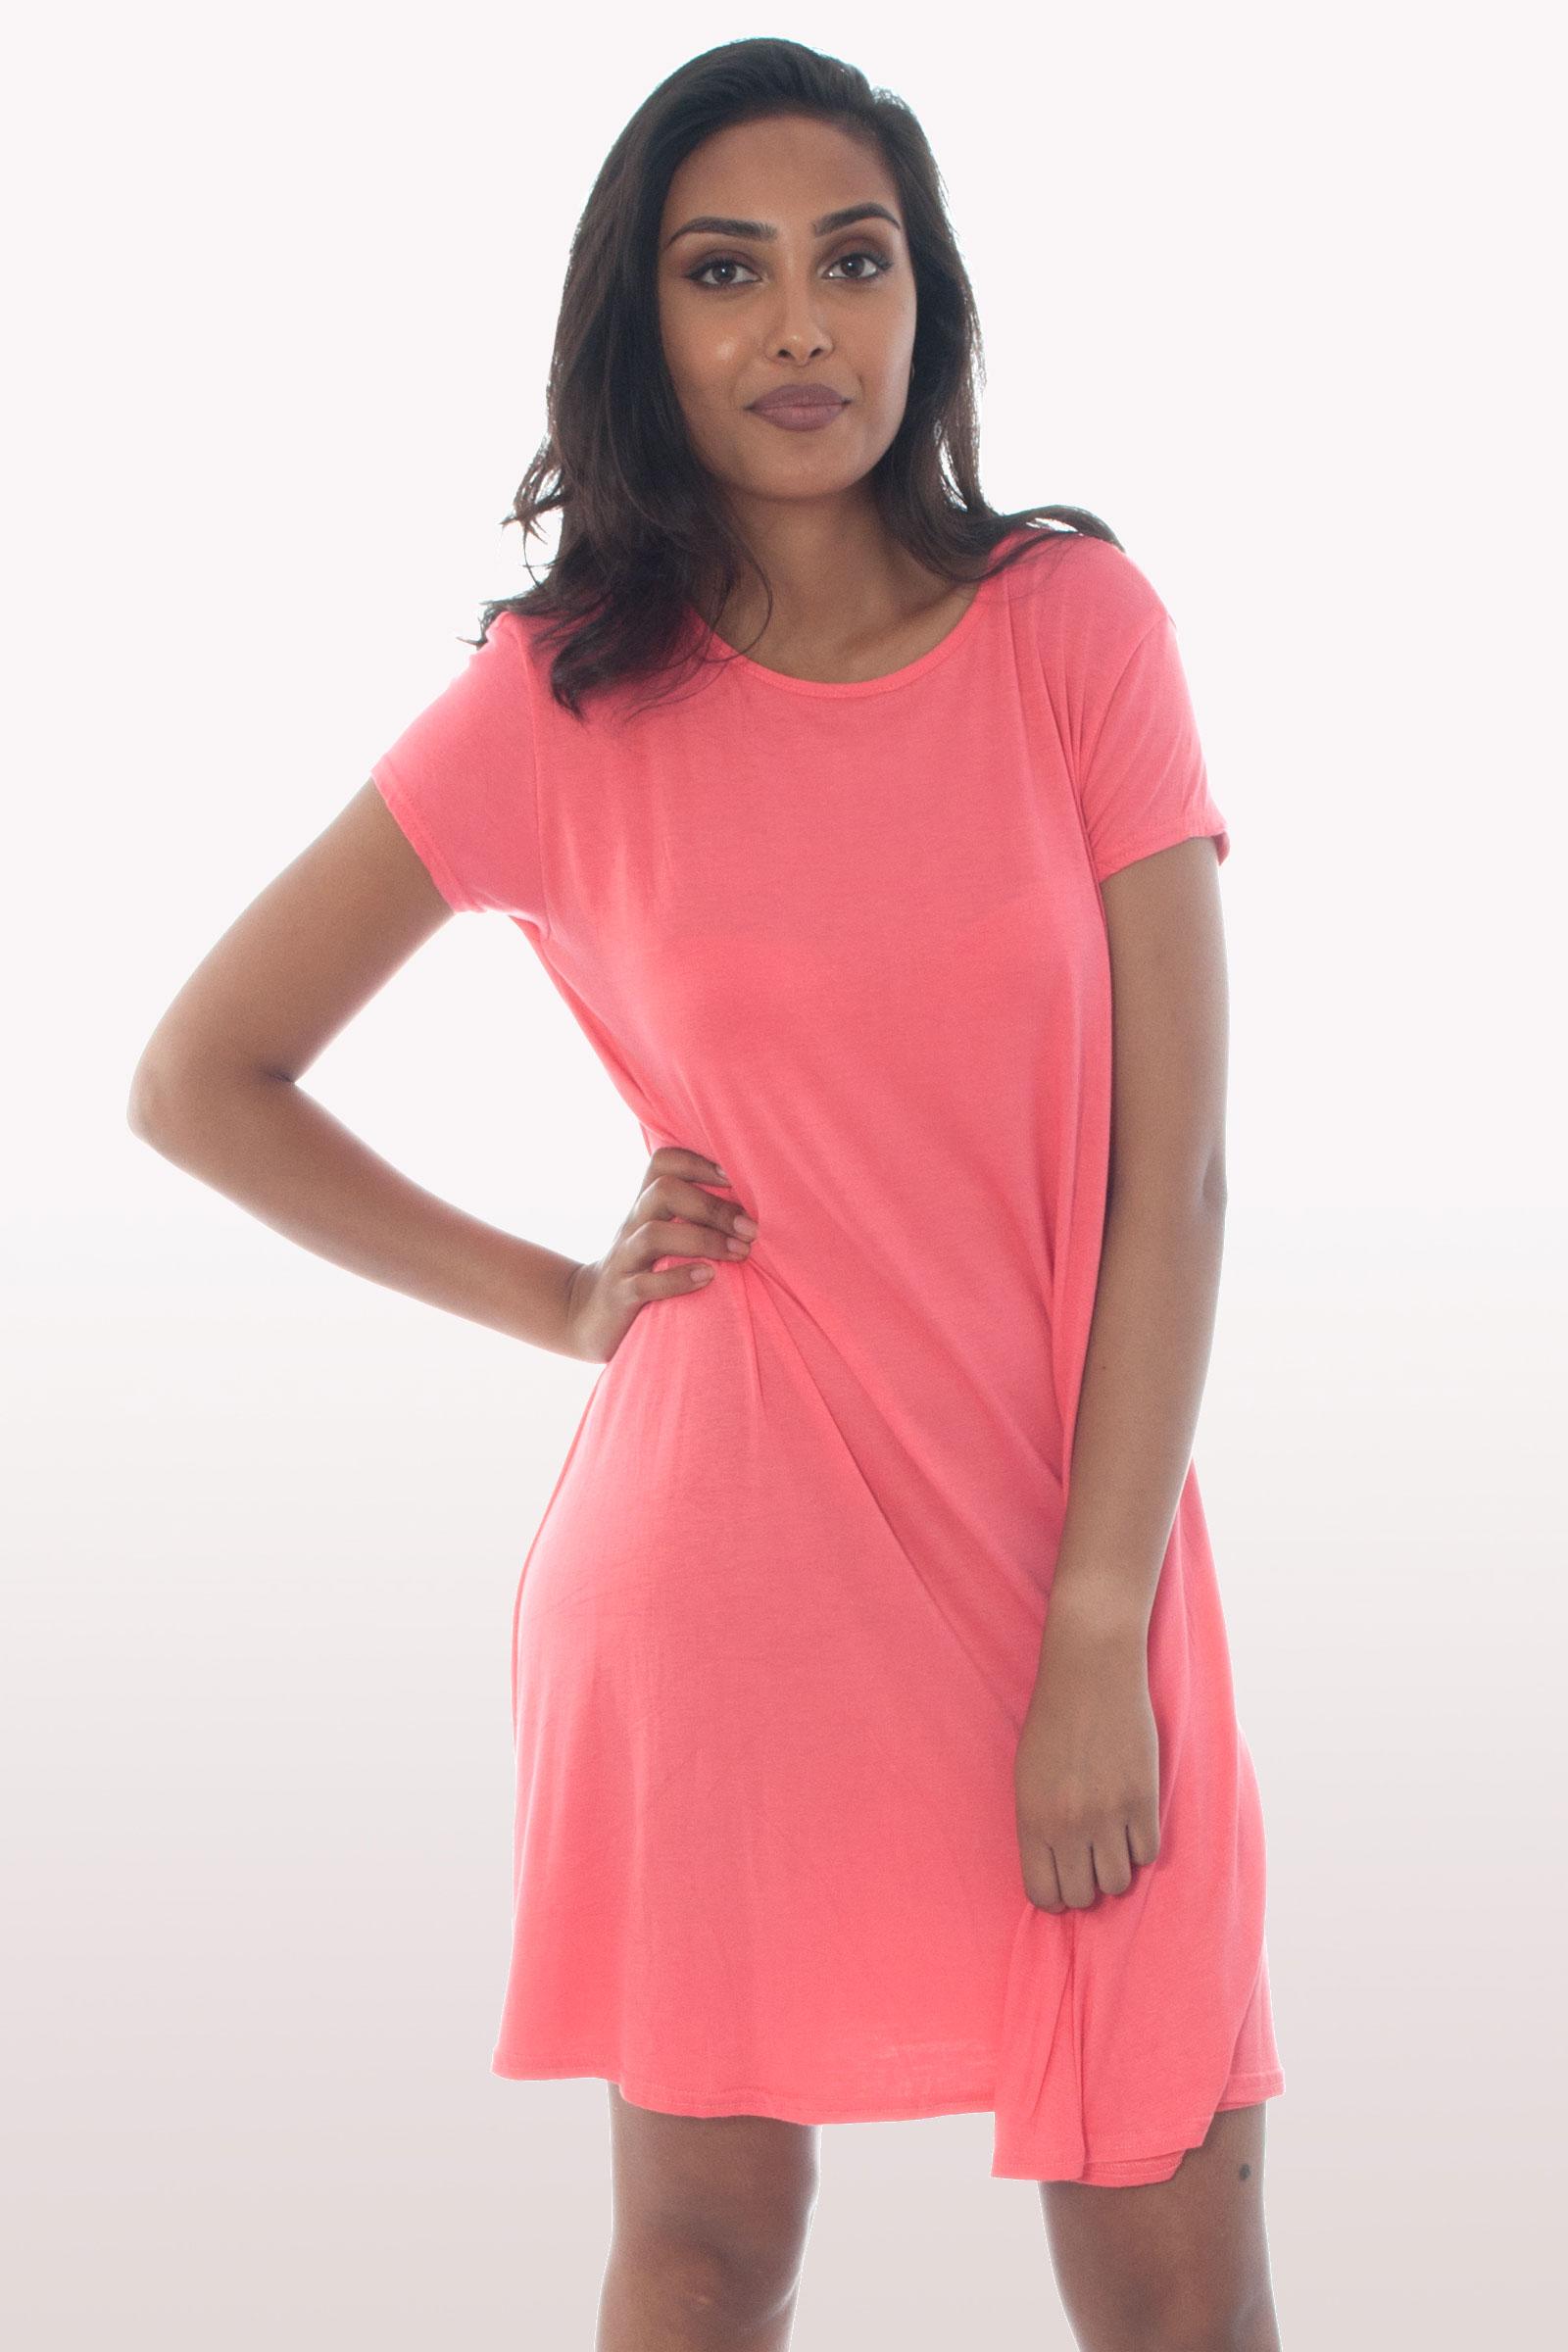 Coral Short Sleeve Swing Dress Dresses Modamore